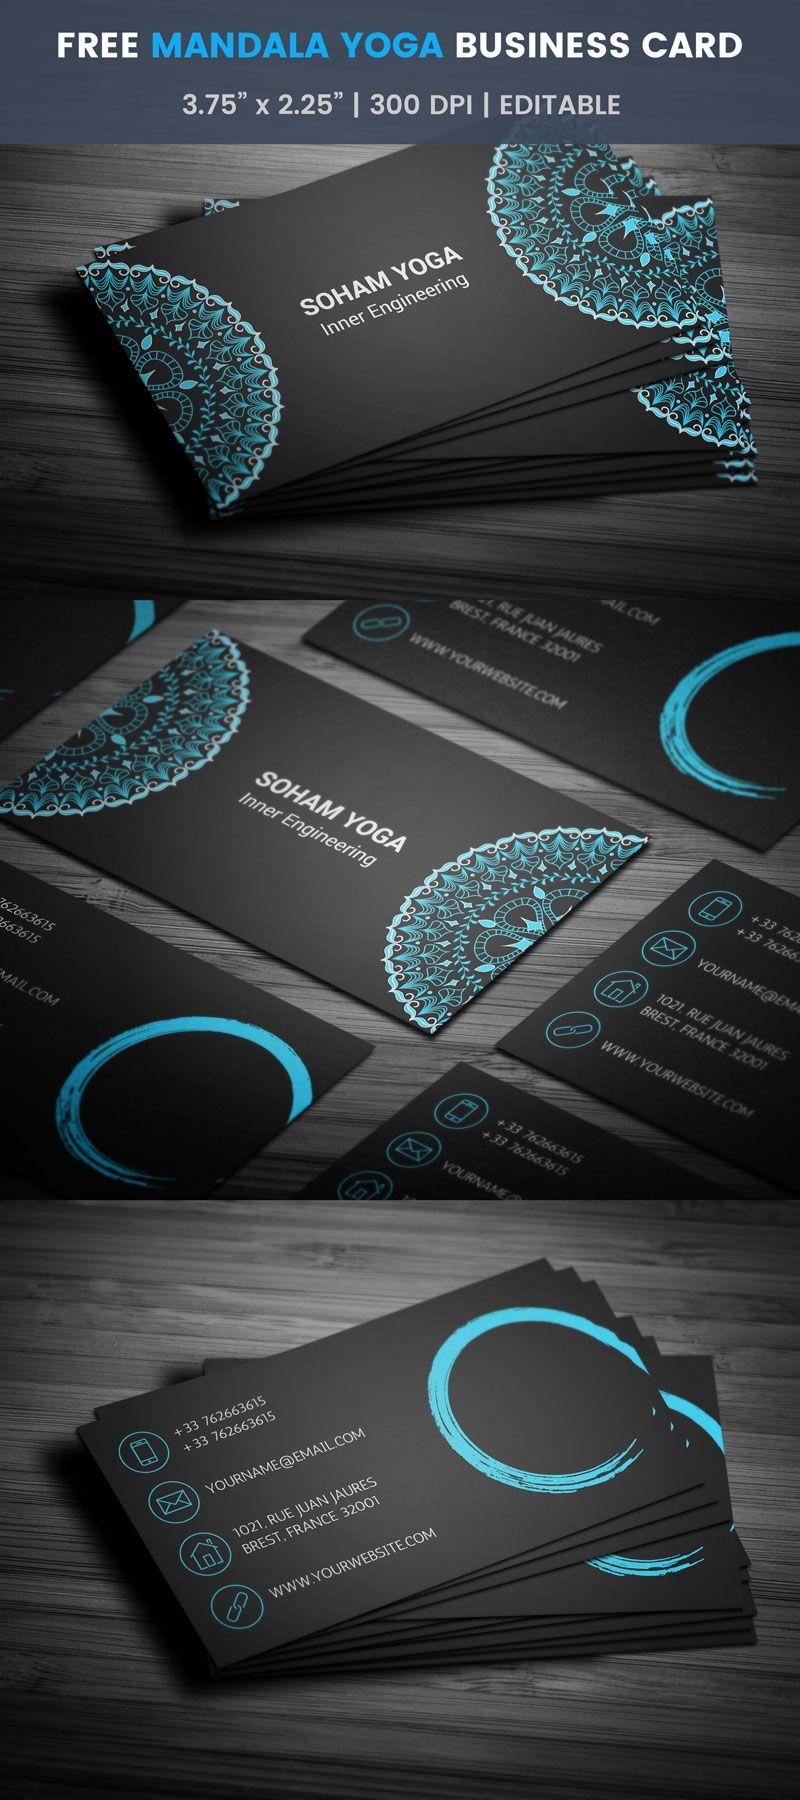 Free Mandala Yoga Business Card Template East Meditation Zen Printing Business Cards Free Business Card Templates Business Cards